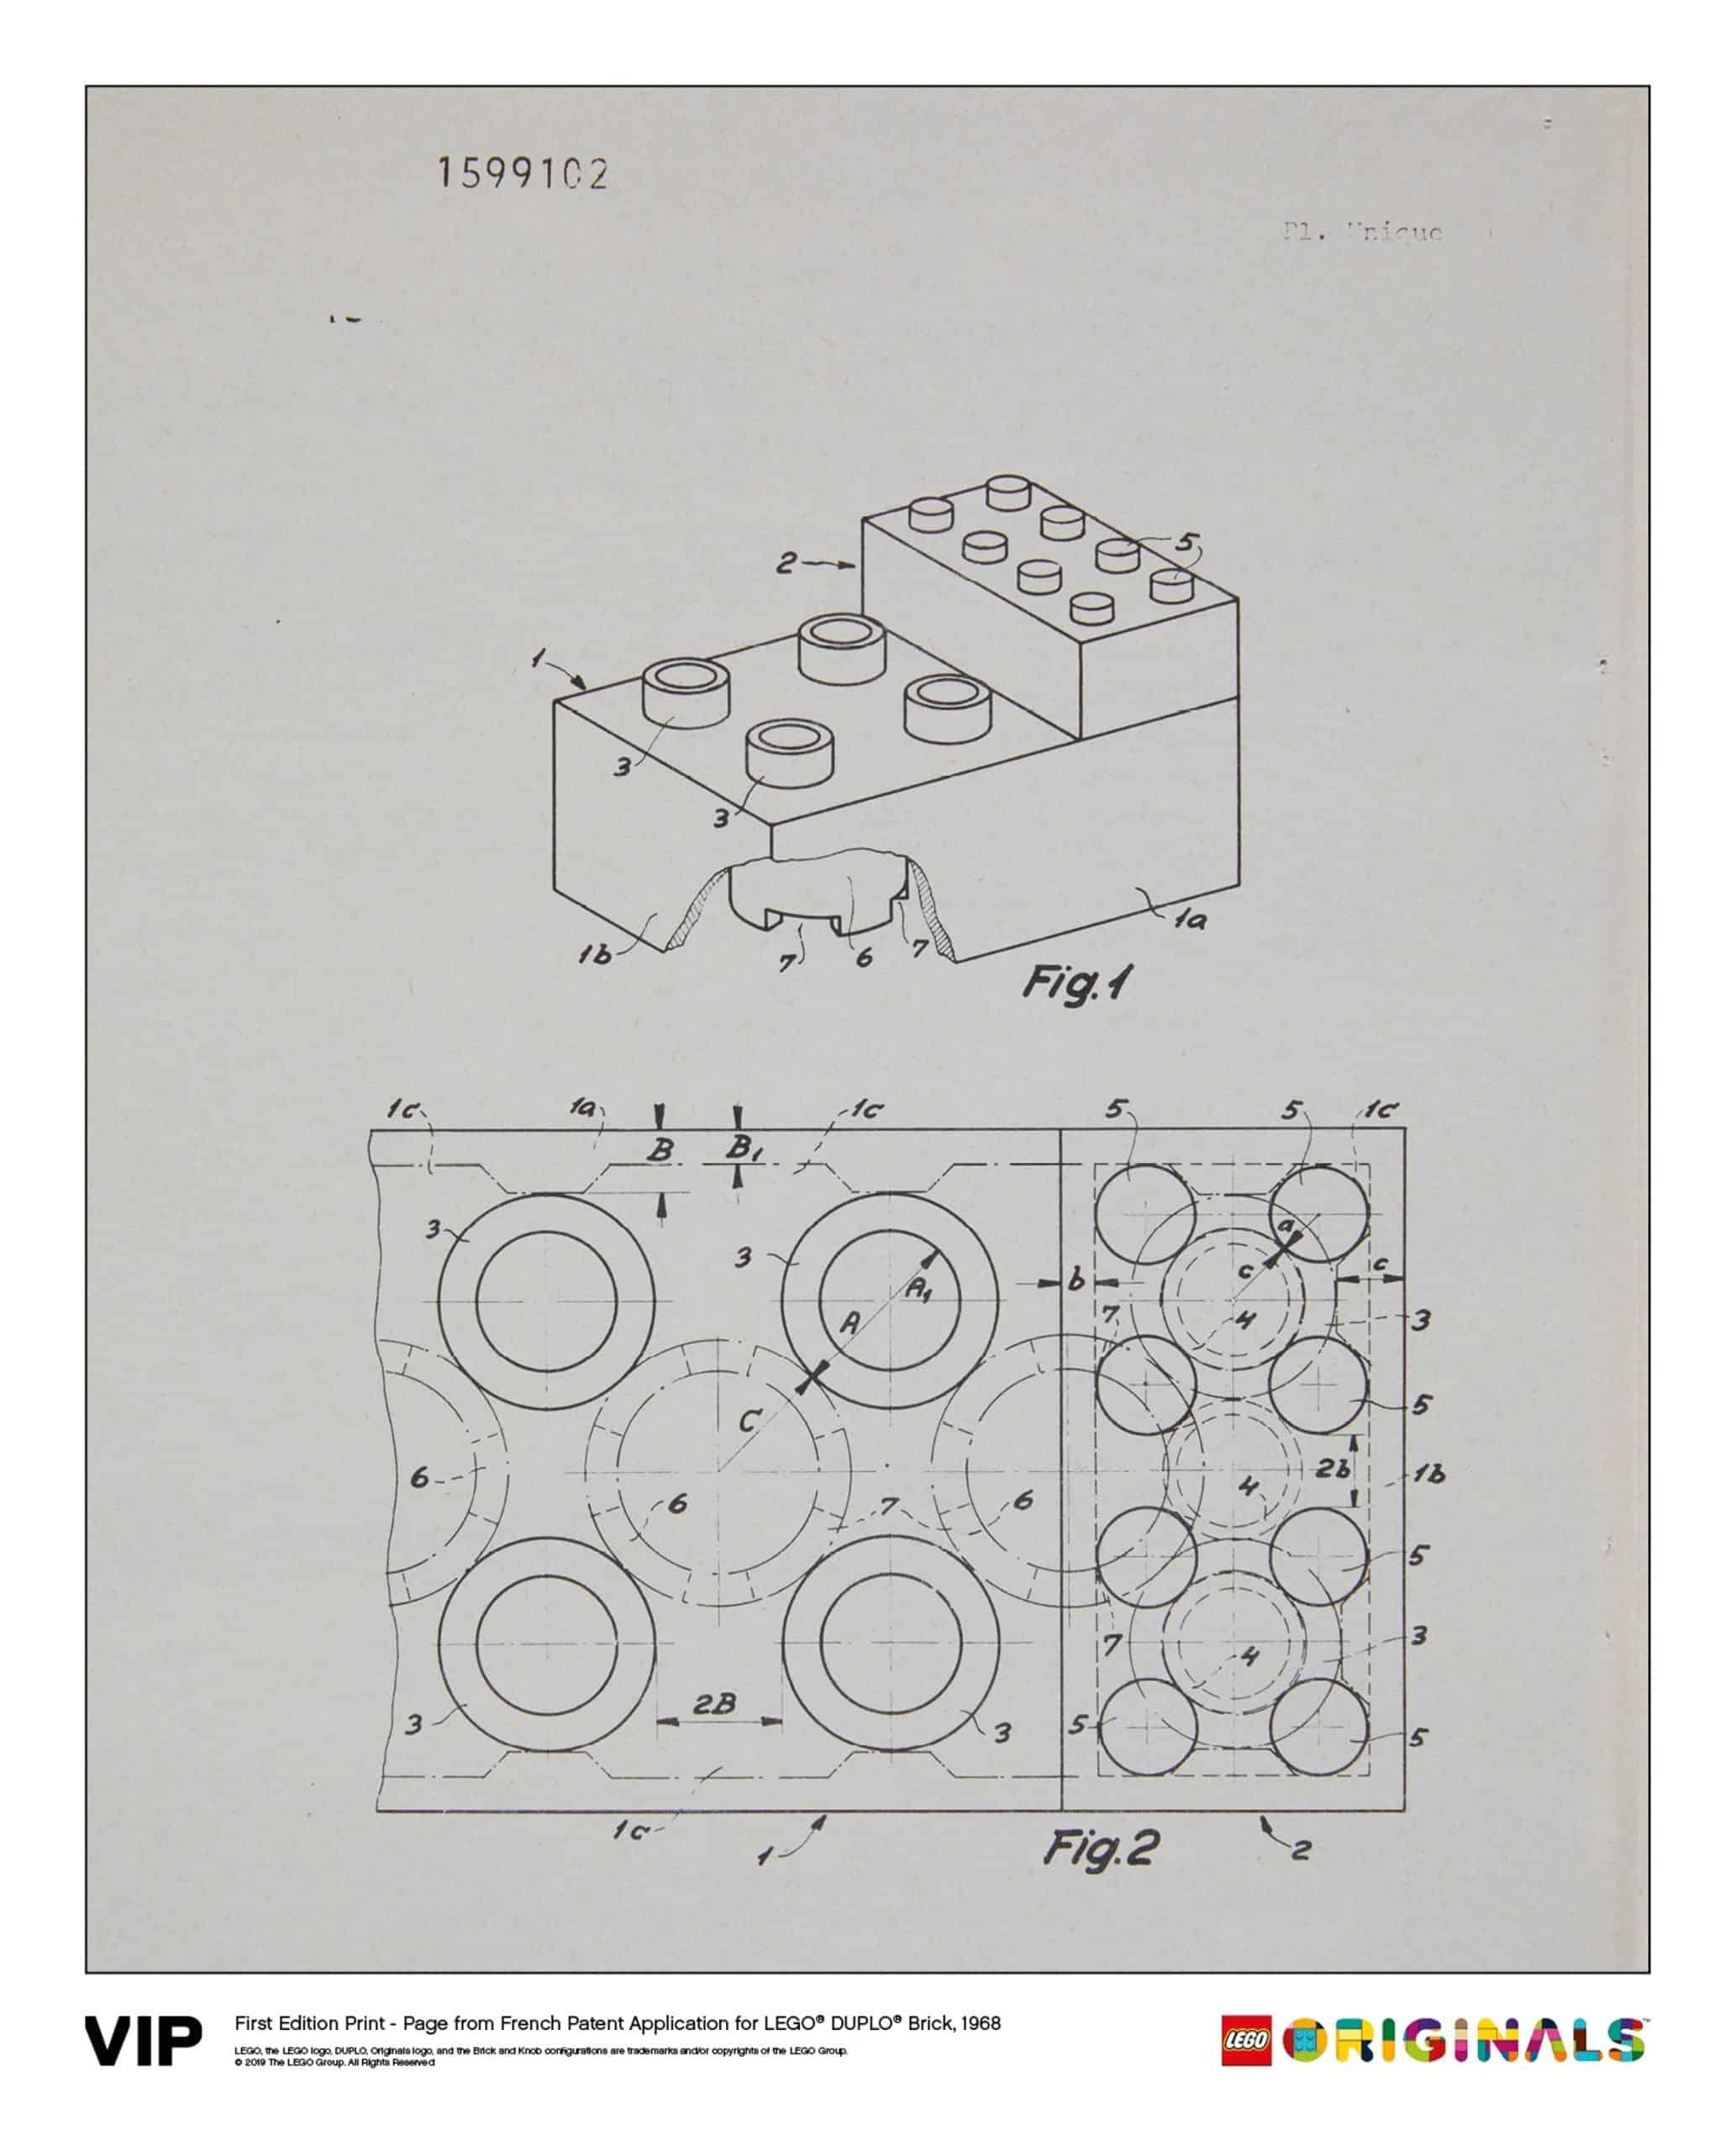 french patent lego 5005998 duplo 5005998 brick 1968 scaled